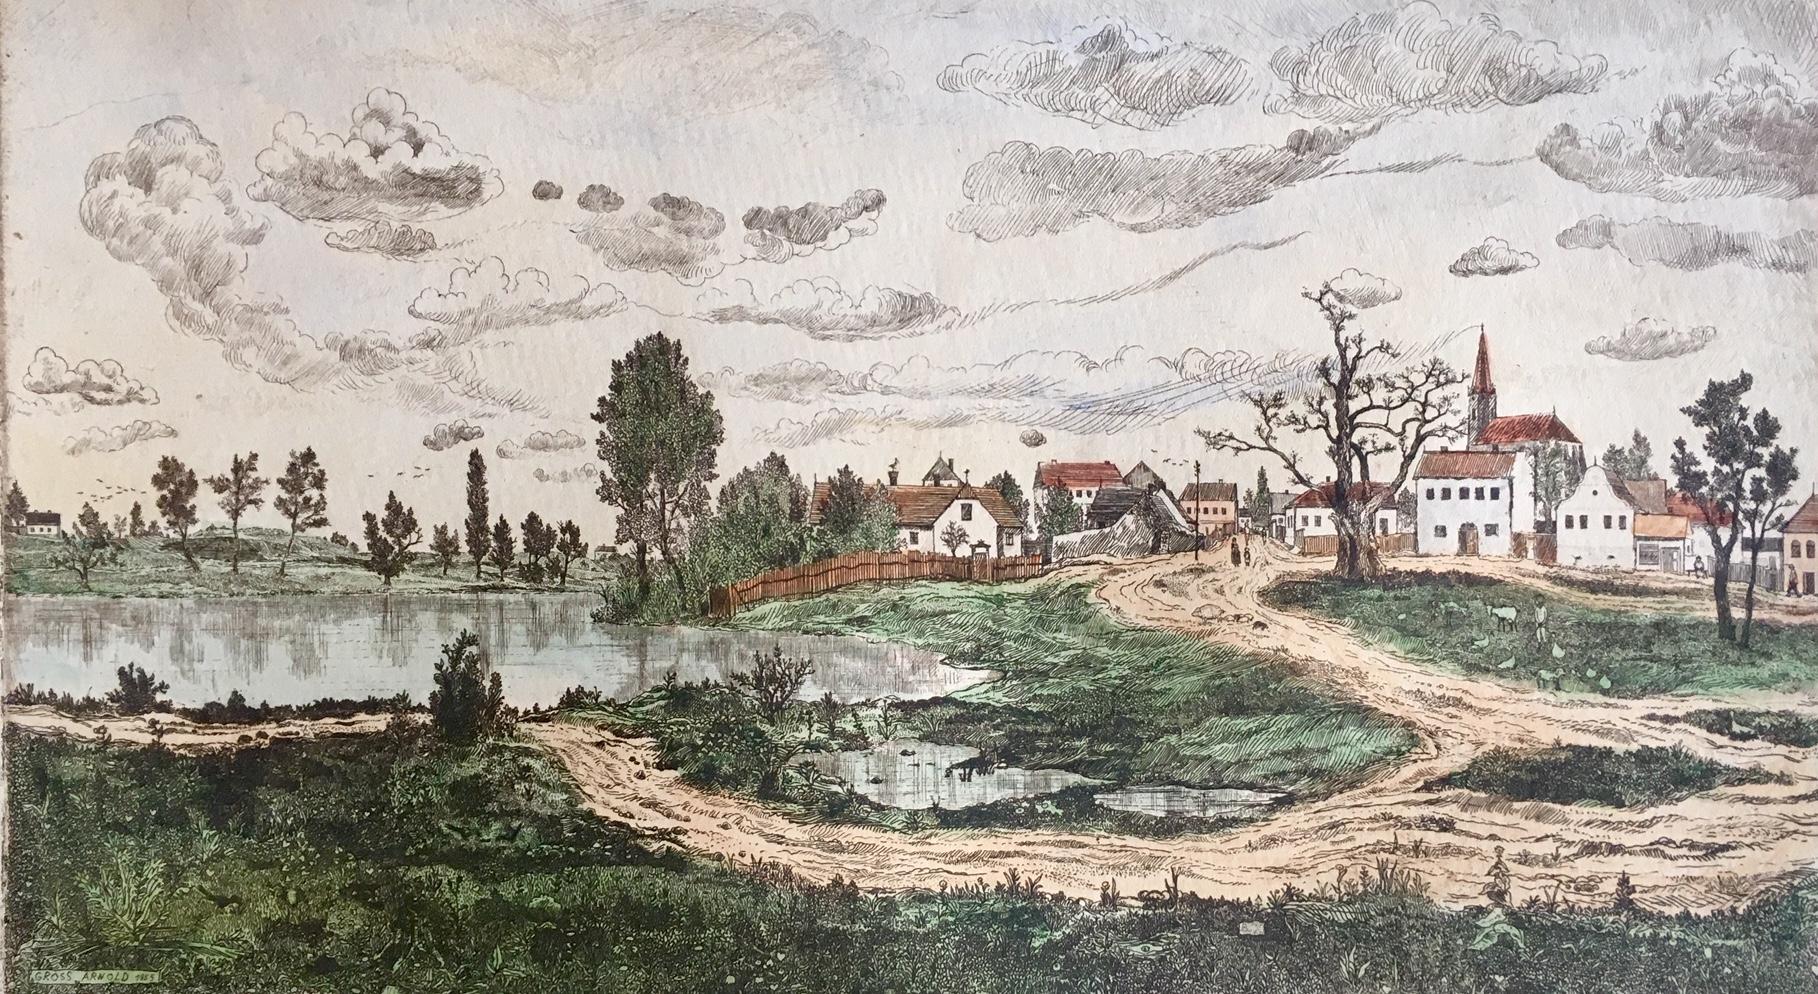 Gross, Arnold: Landscape